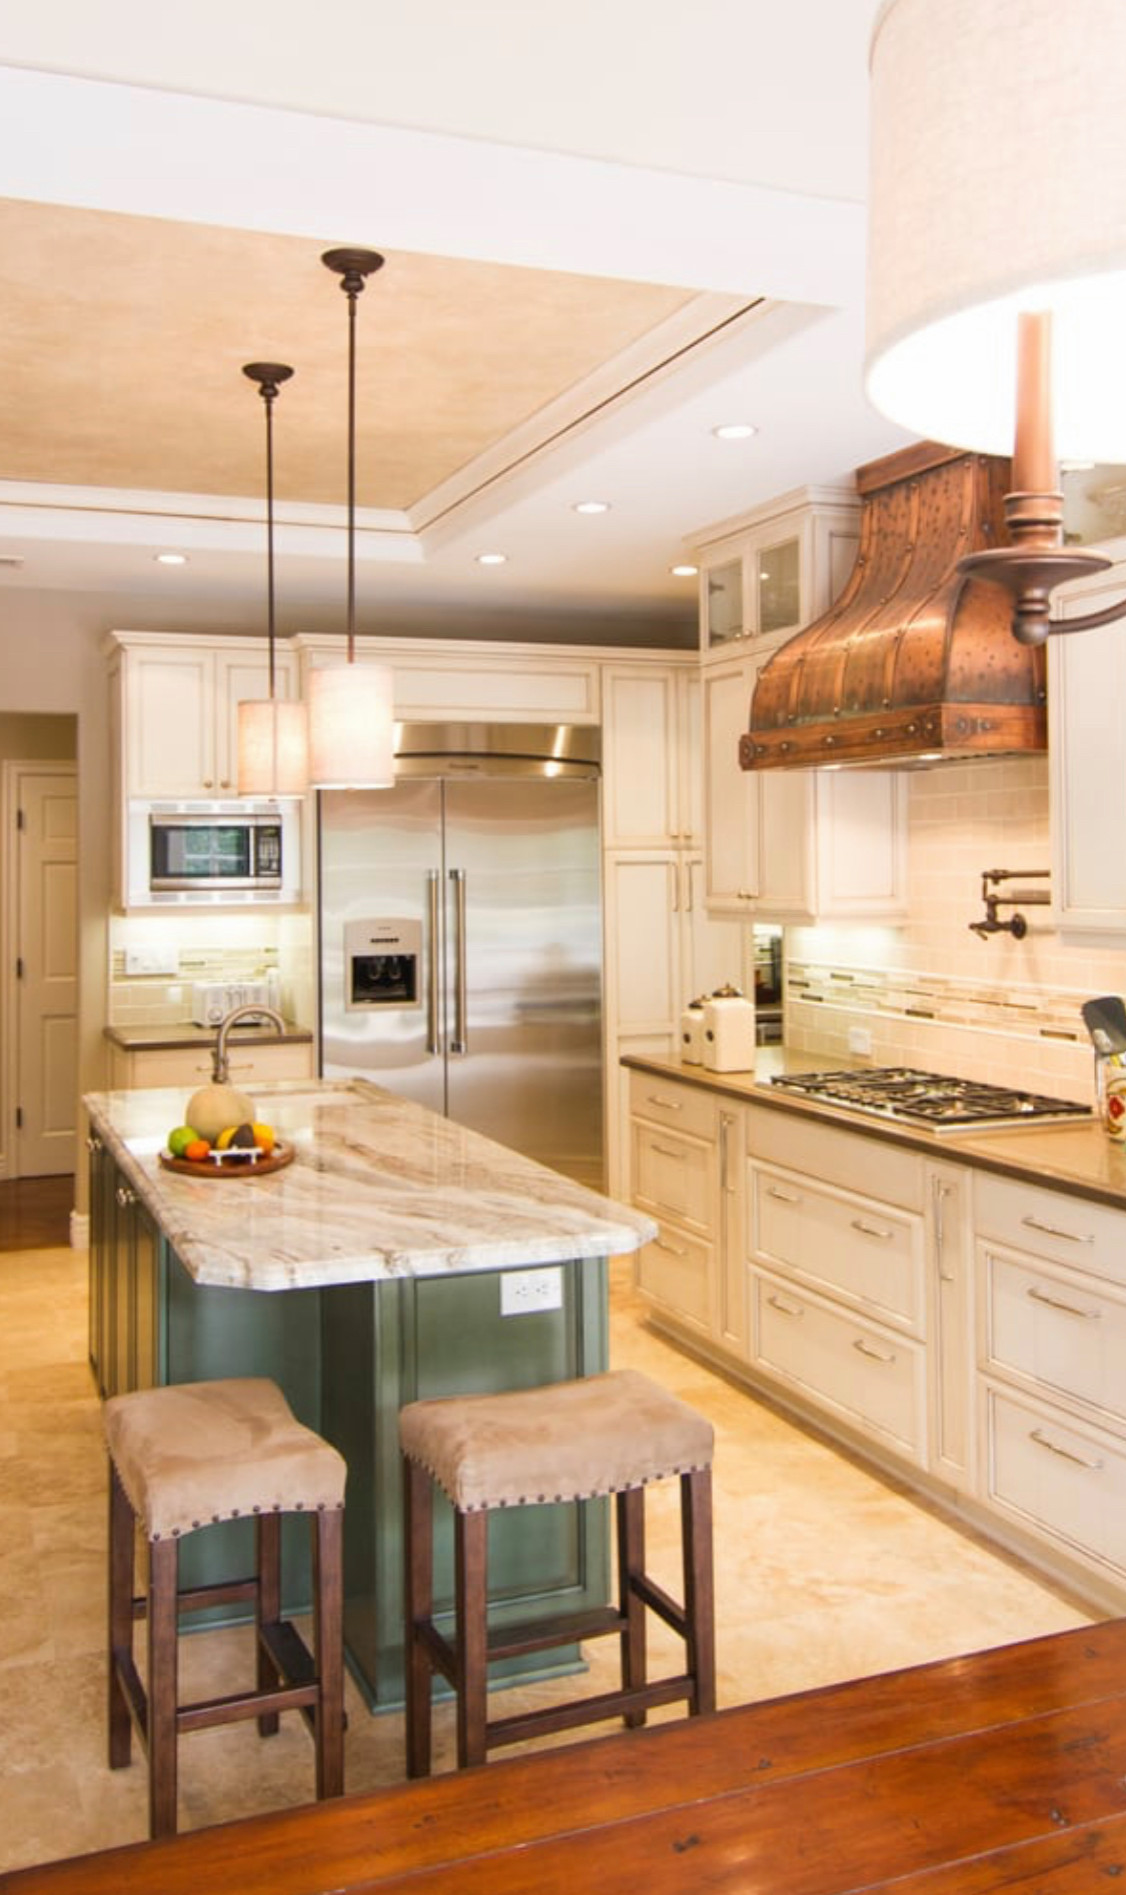 Kitchen renewal in Thousand Oaks